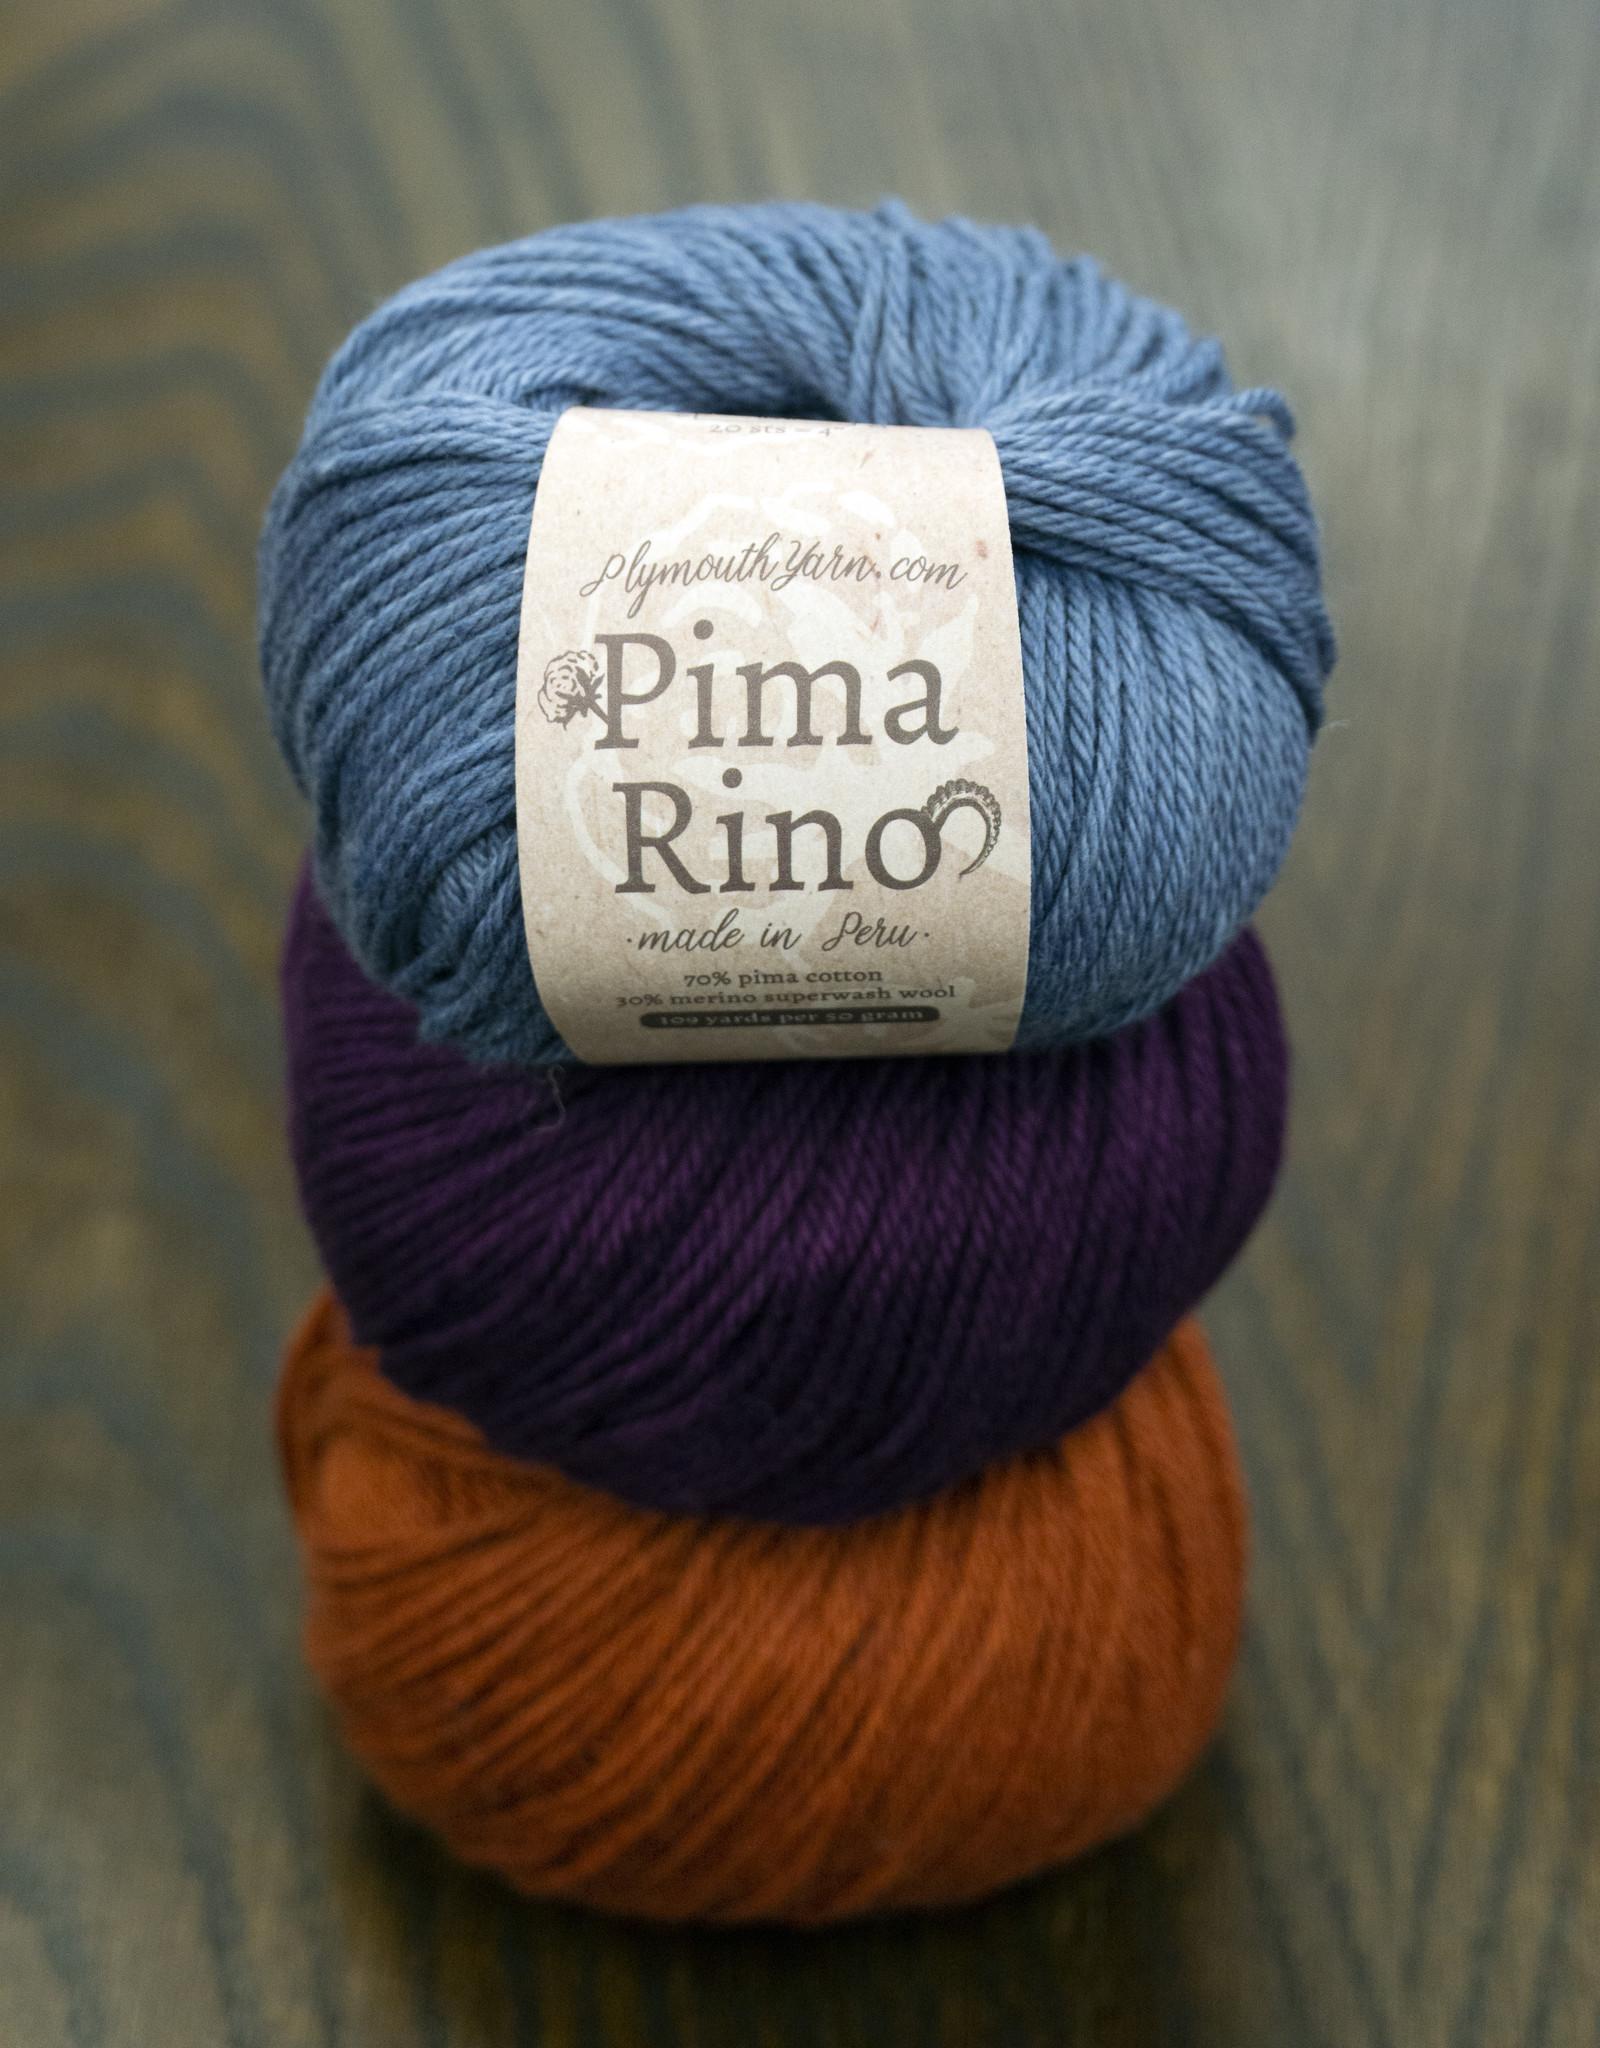 Plymouth Yarn Pima Rino